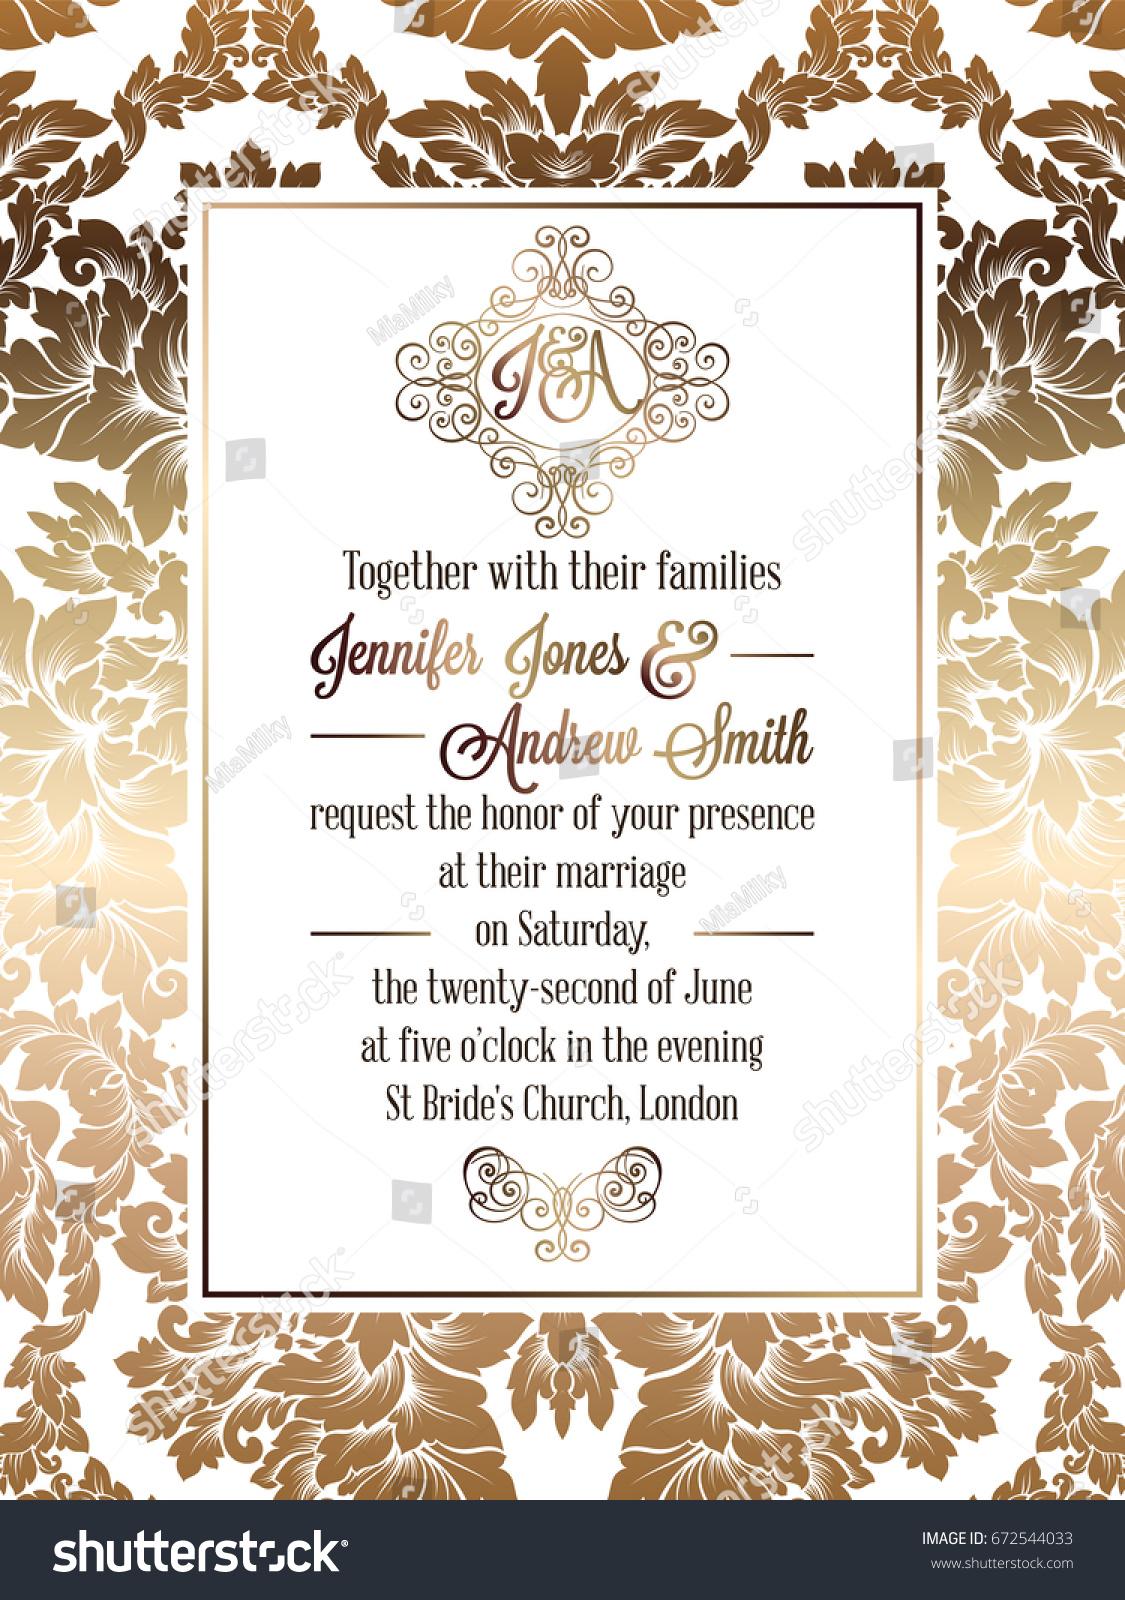 Vintage baroque style wedding invitation card stock vector 672544033 vintage baroque style wedding invitation card stock vector 672544033 shutterstock stopboris Gallery